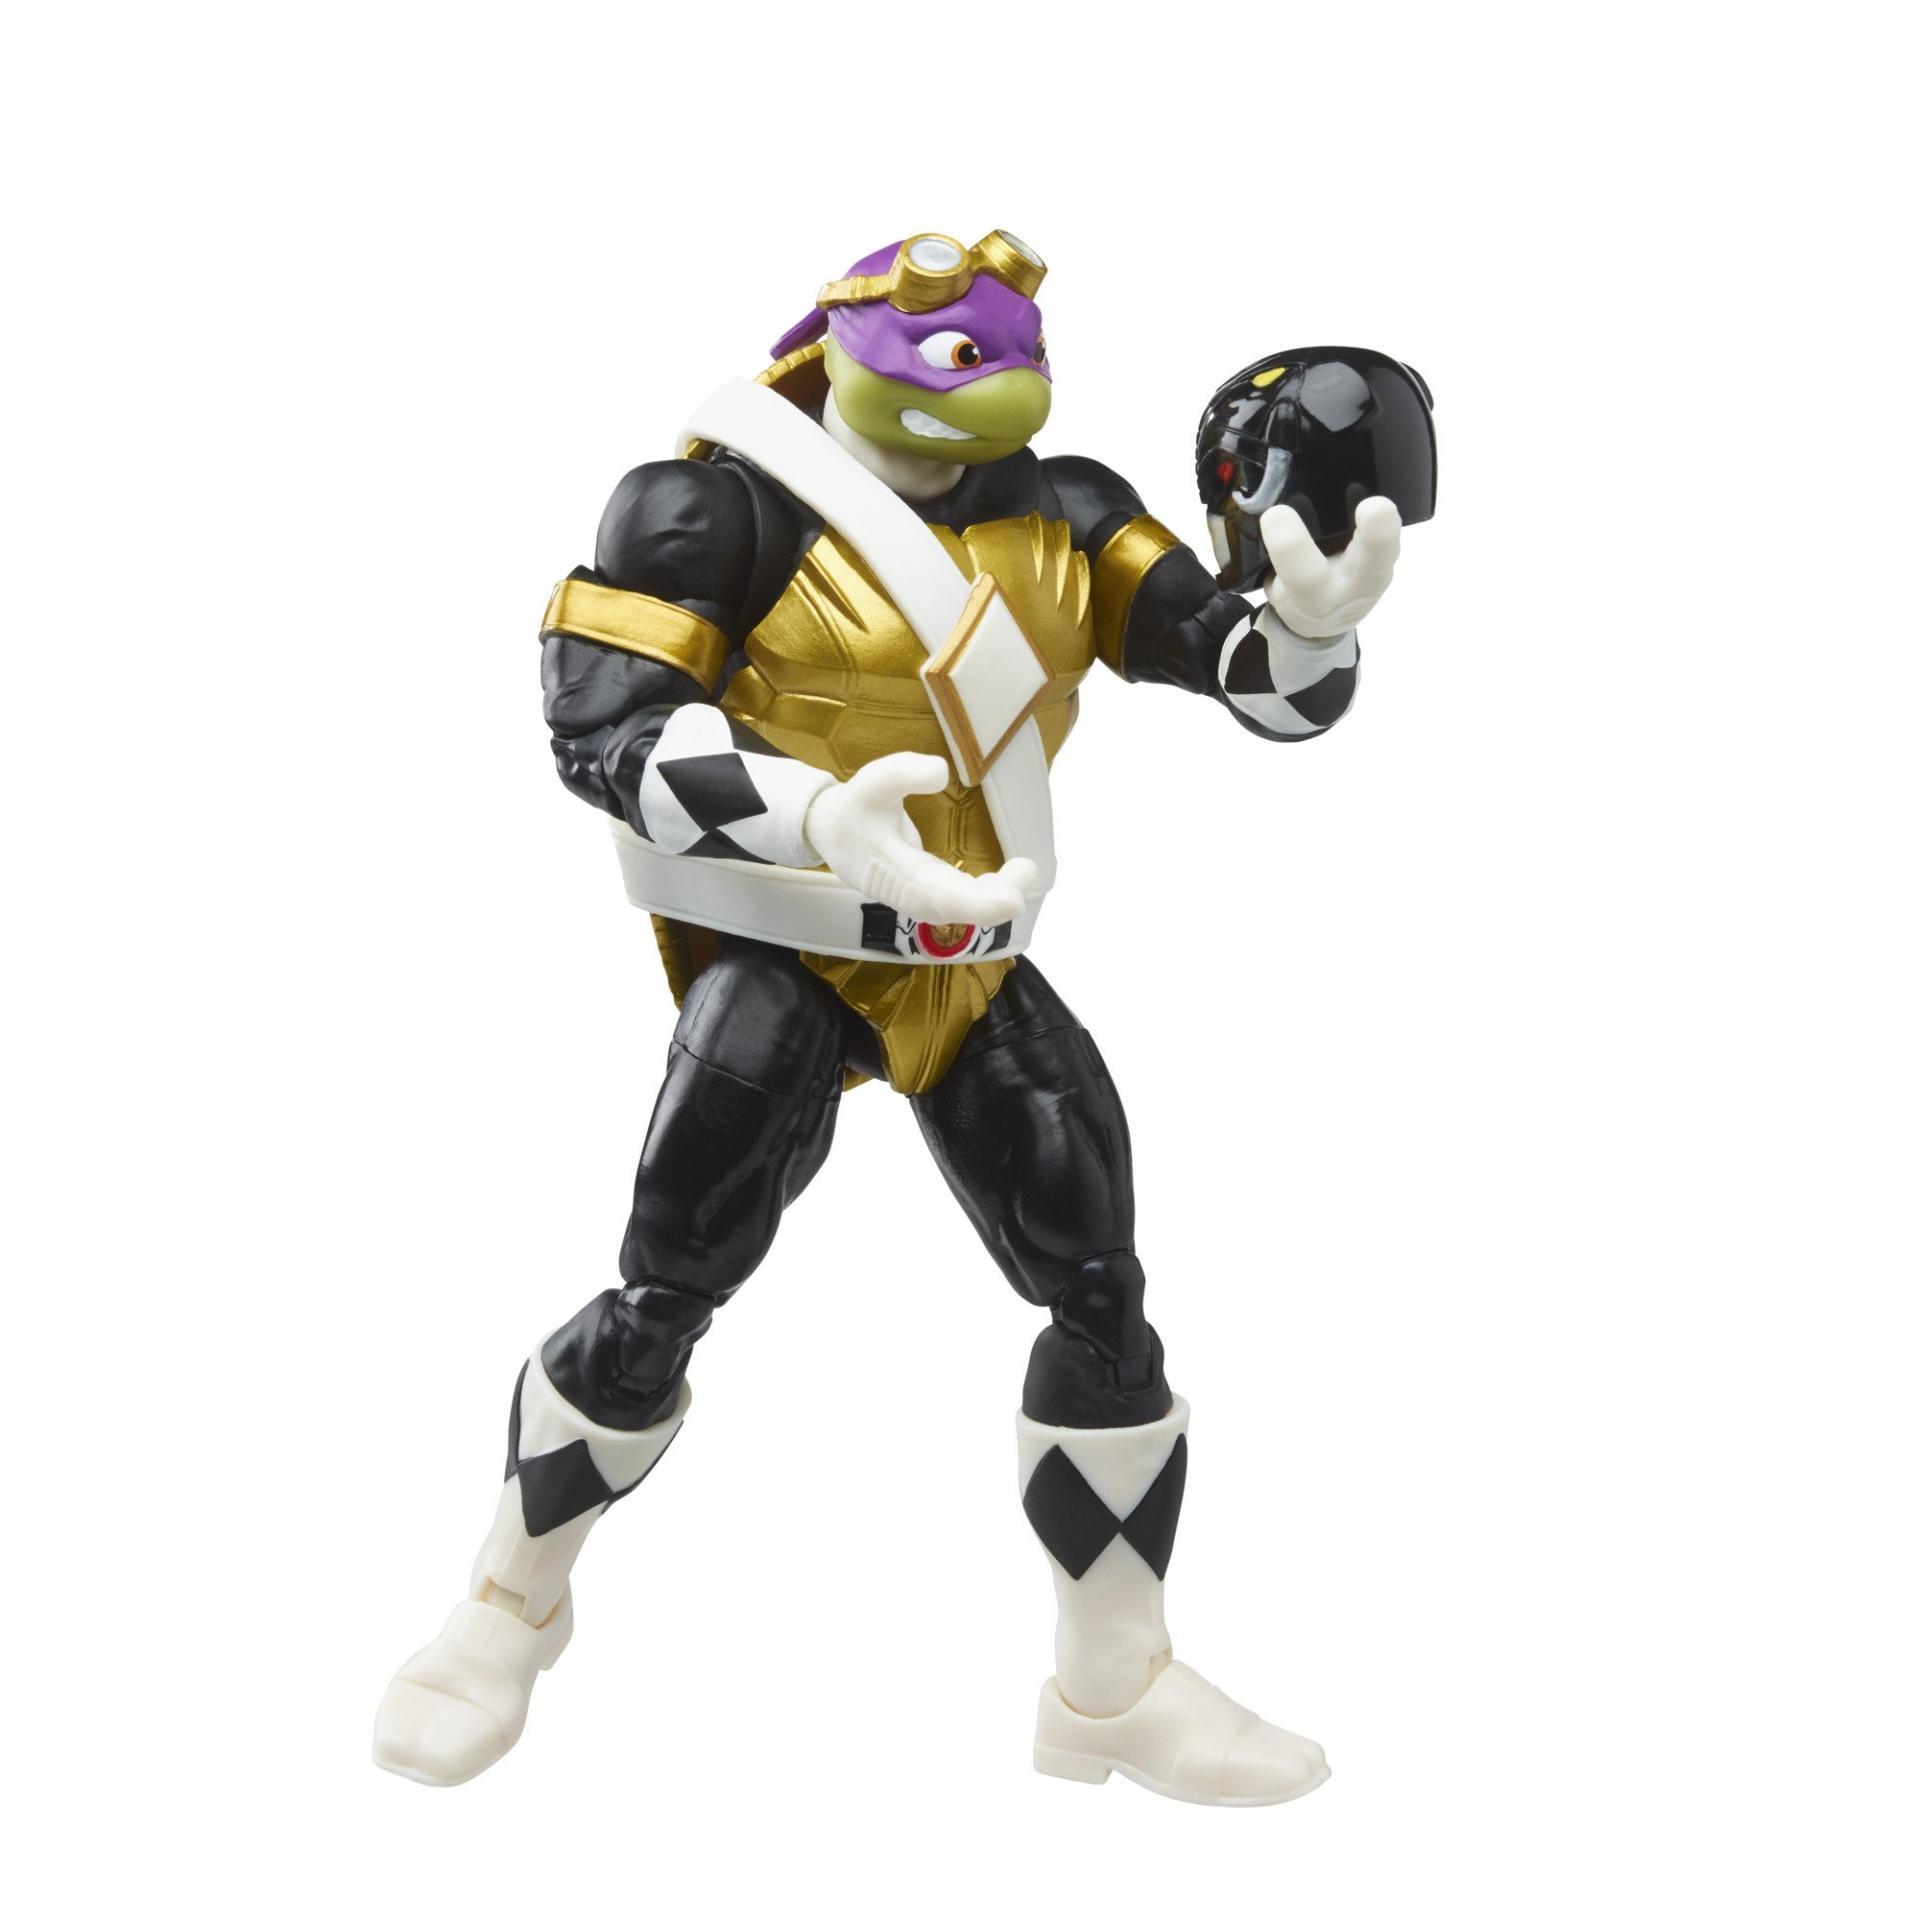 Power rangers tortue ninja tmnt lightning collection morphed donatello morphed leonardo 15cm5